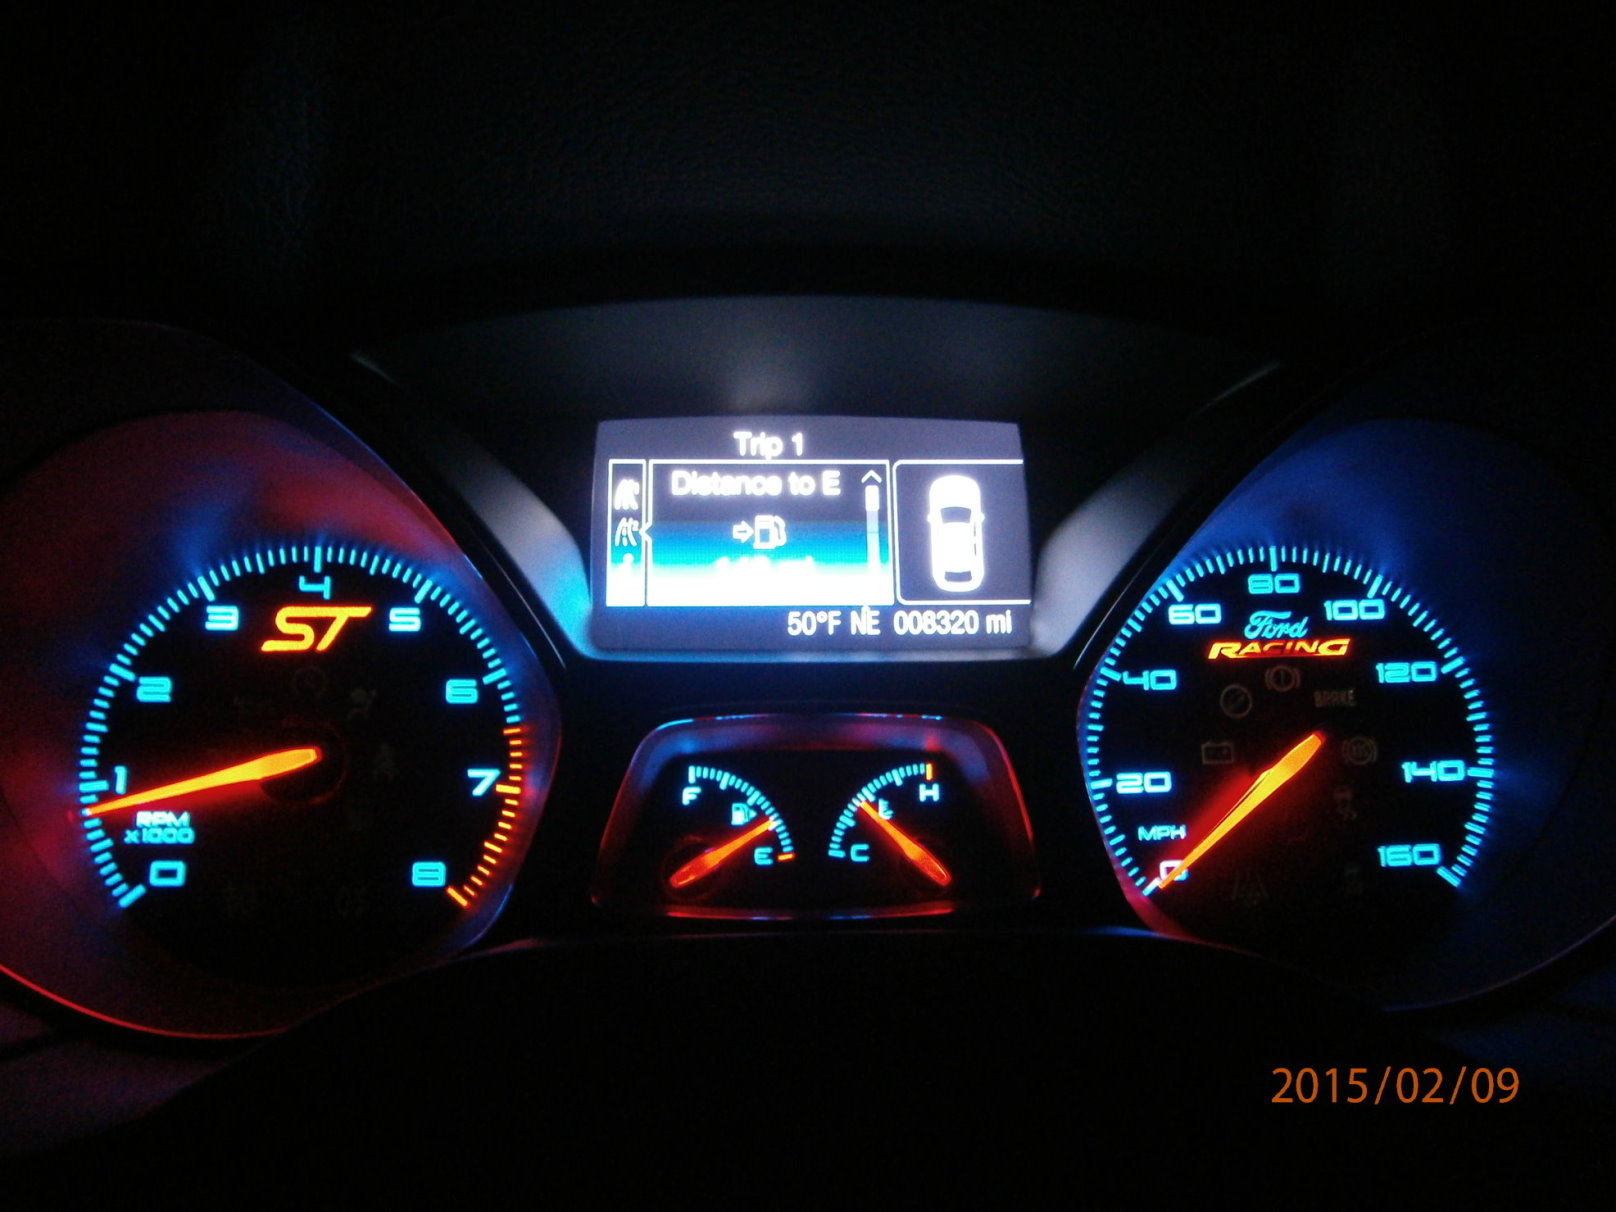 name custom gauge face plates 010 jpg views 1534 size 218 1 kb